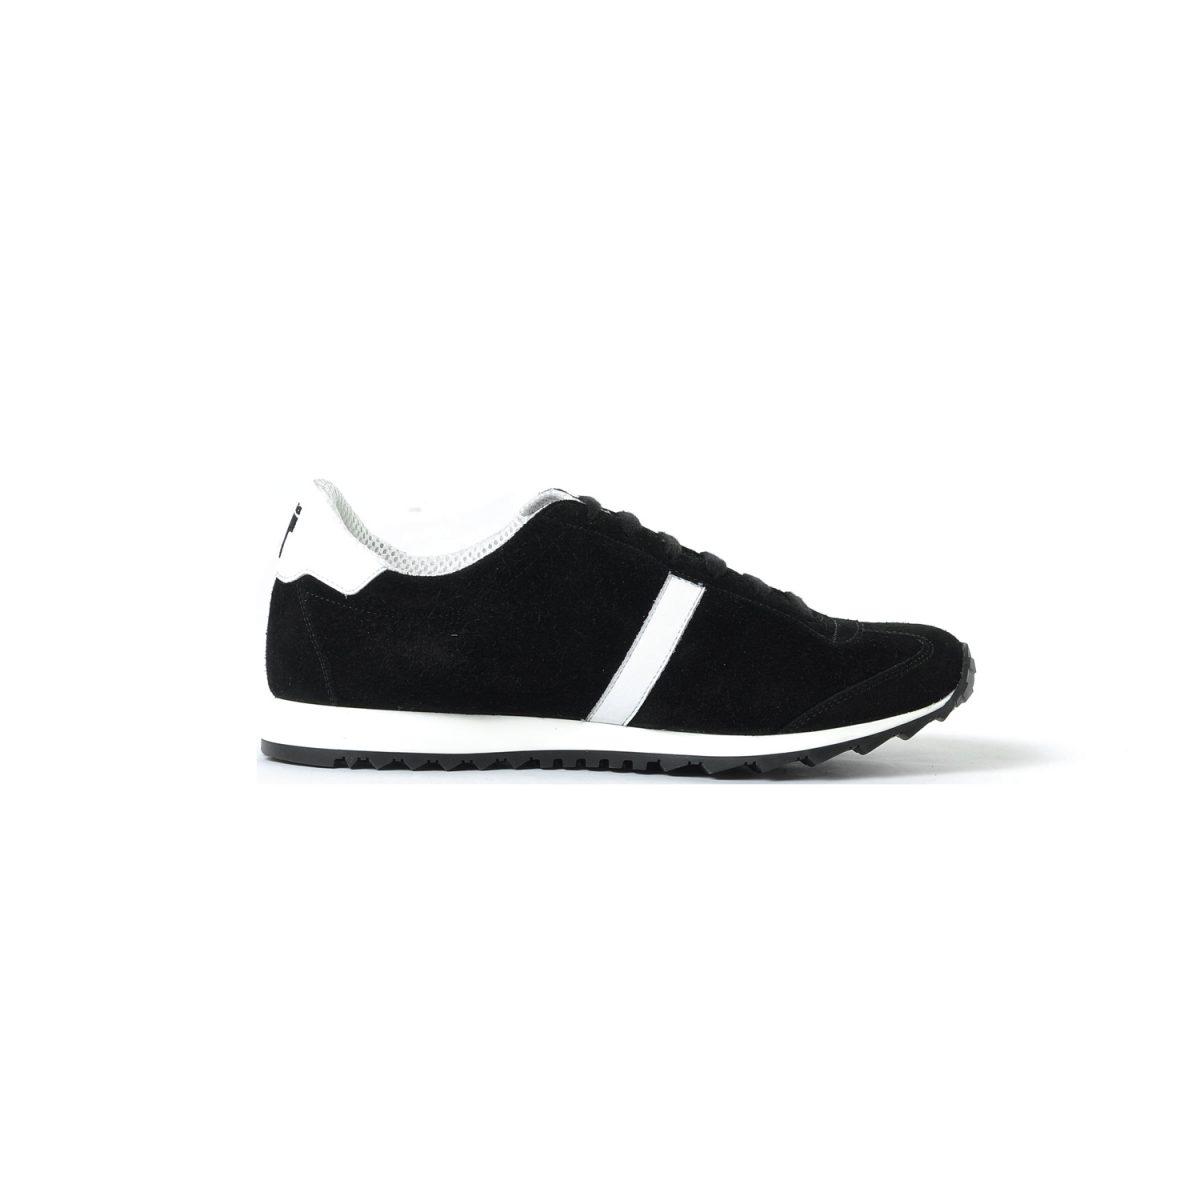 Tisza cipő - Martfű - Fekete-fehér